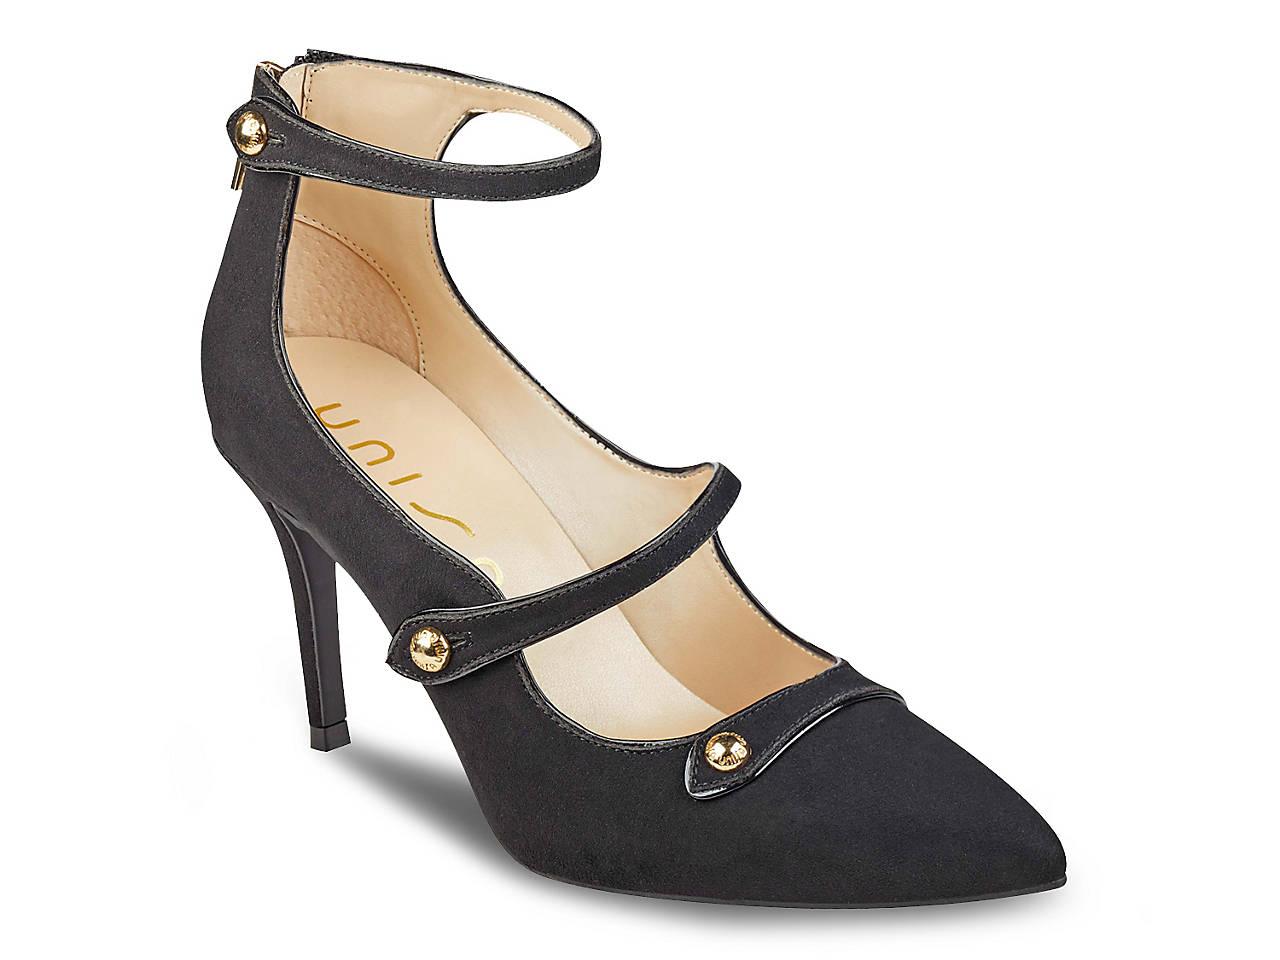 4b8c76d1da24 Unisa Dext II Pump Women s Shoes